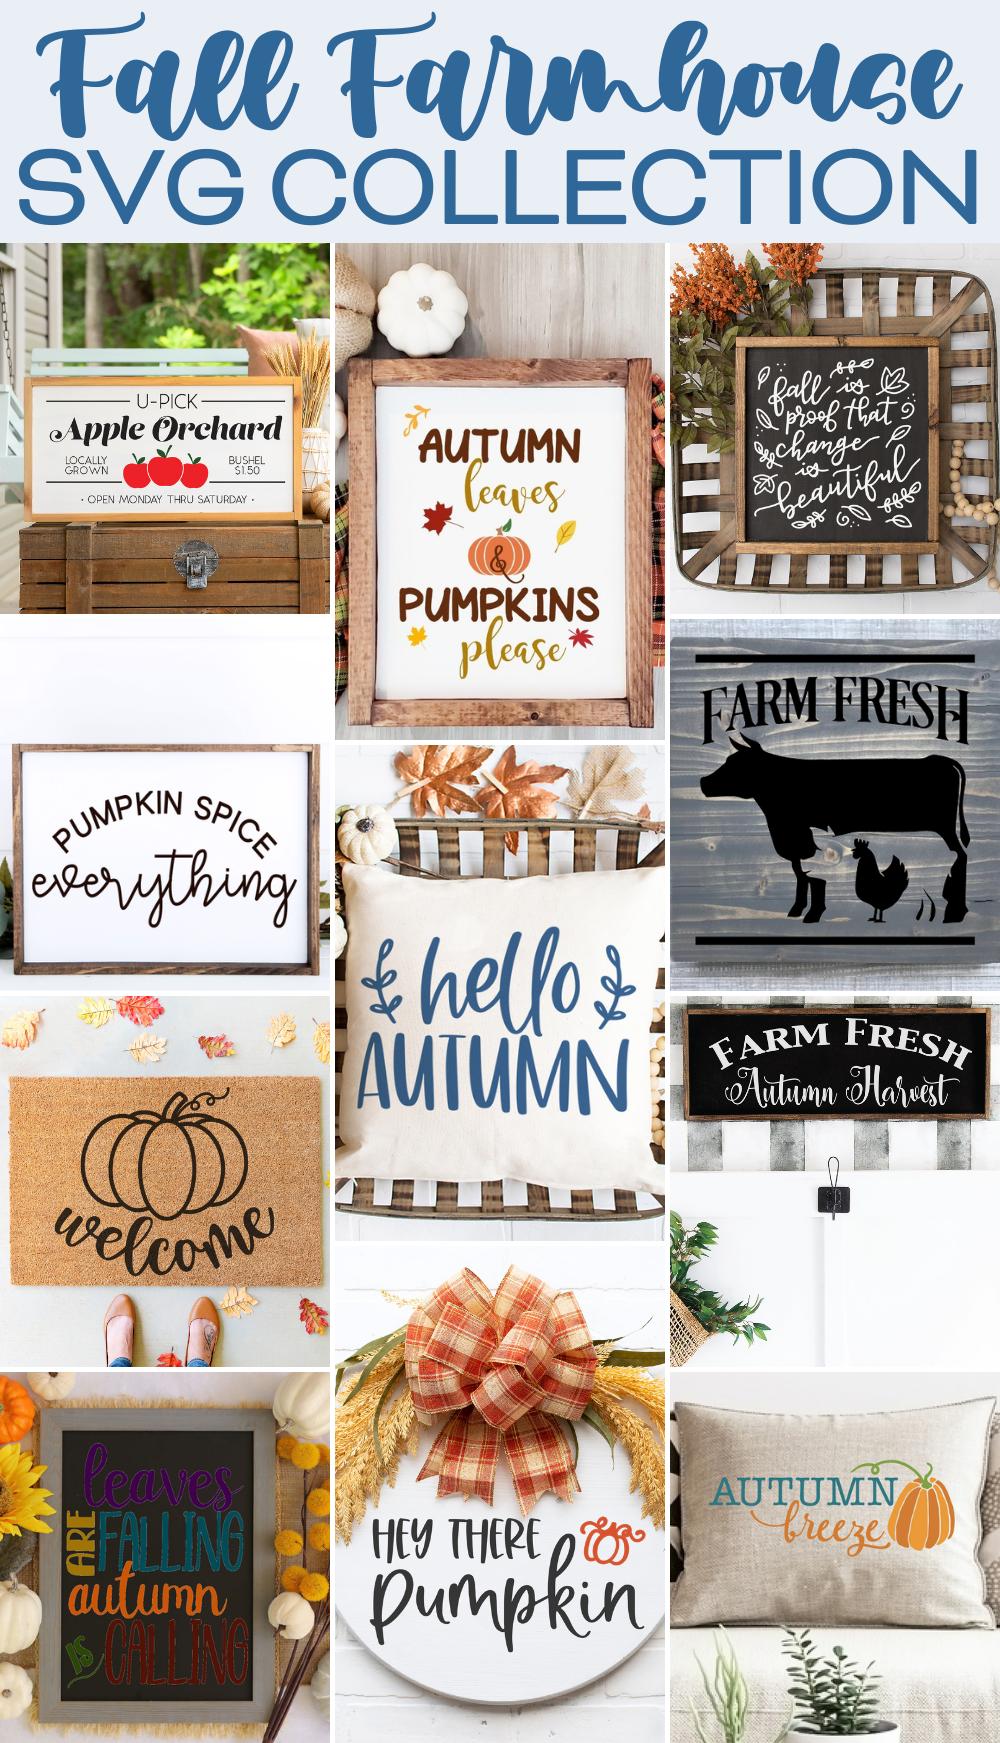 Fall Farmhoue SVG Collection - 11 Fall Farmhouse SVG cut files.